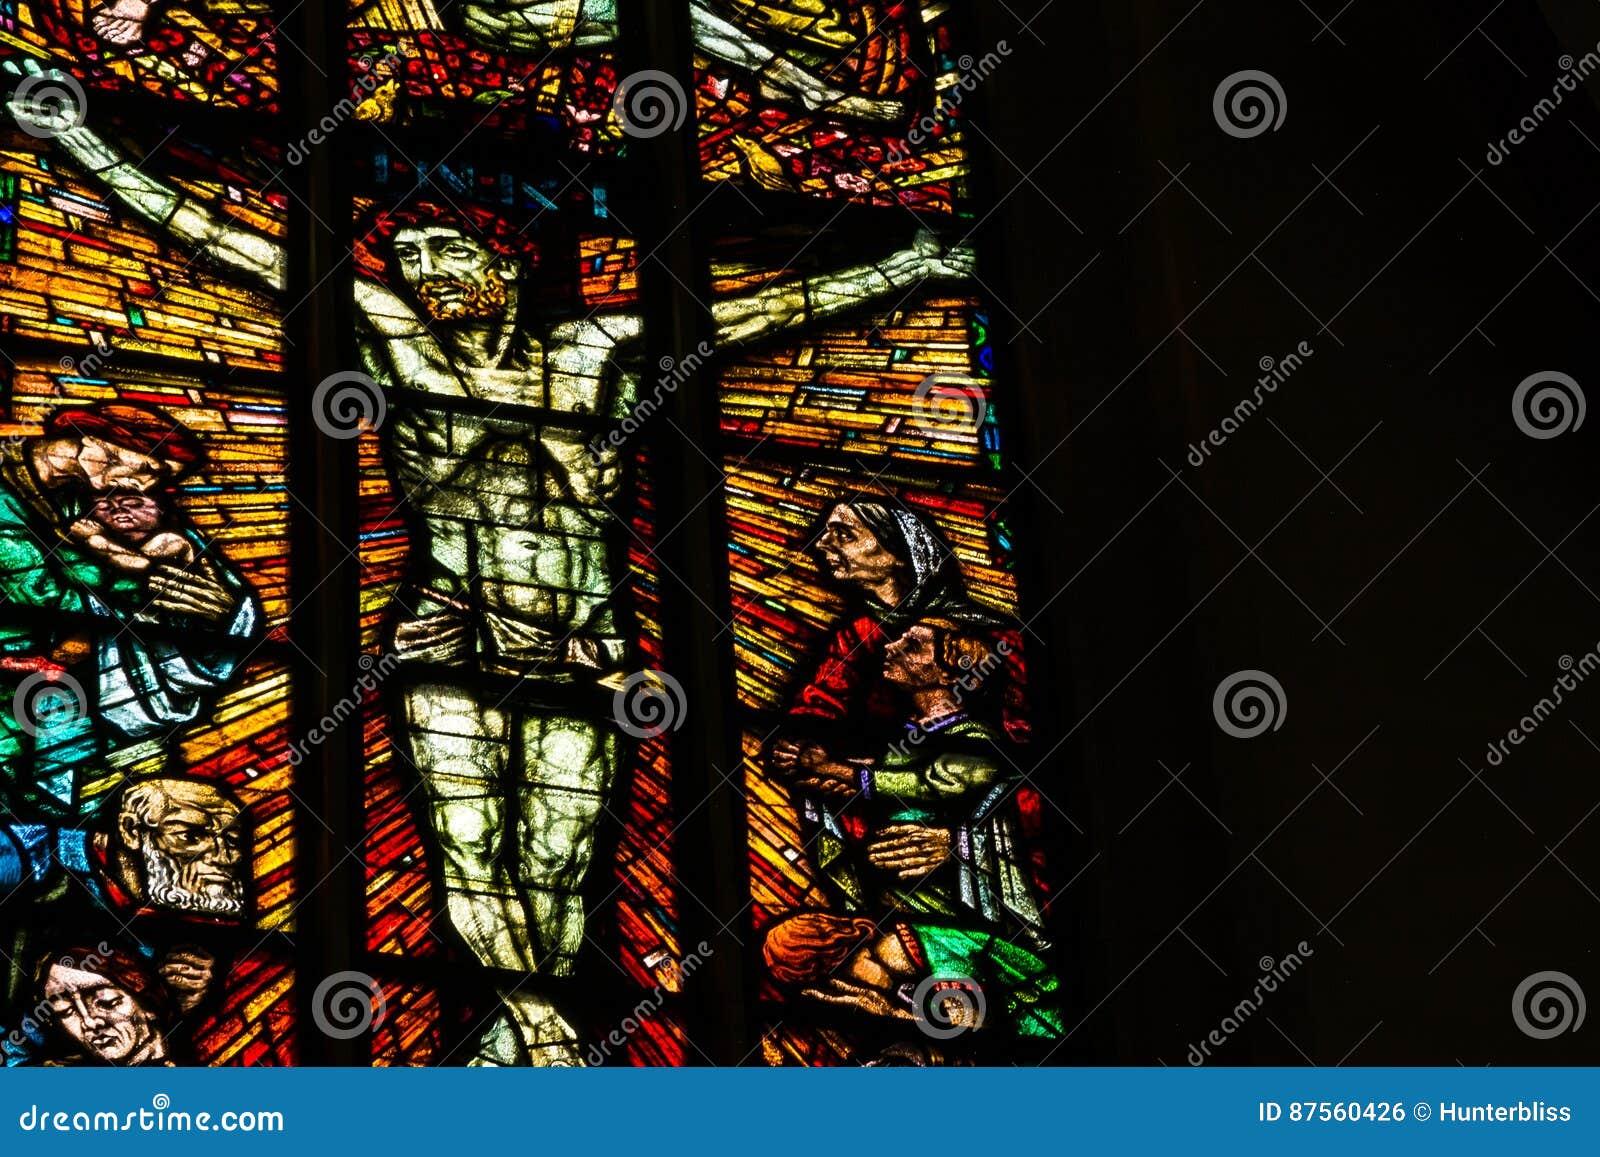 Buntglas-Nahaufnahme-religiöser Kirchen-zuhause Schwarz-Kontrast Te